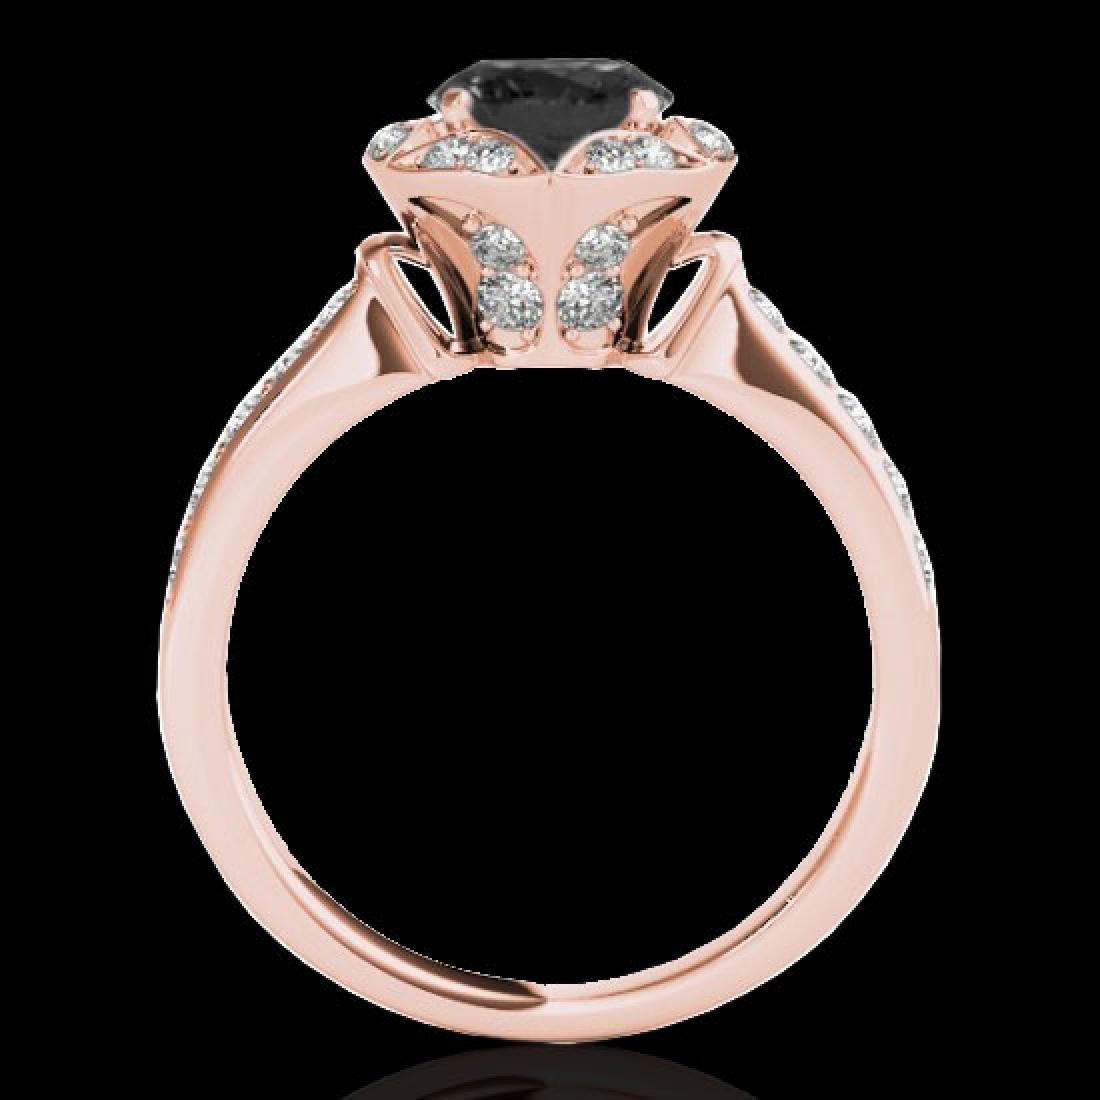 1.5 CTW Certified VS Black Diamond Solitaire Halo Ring - 2